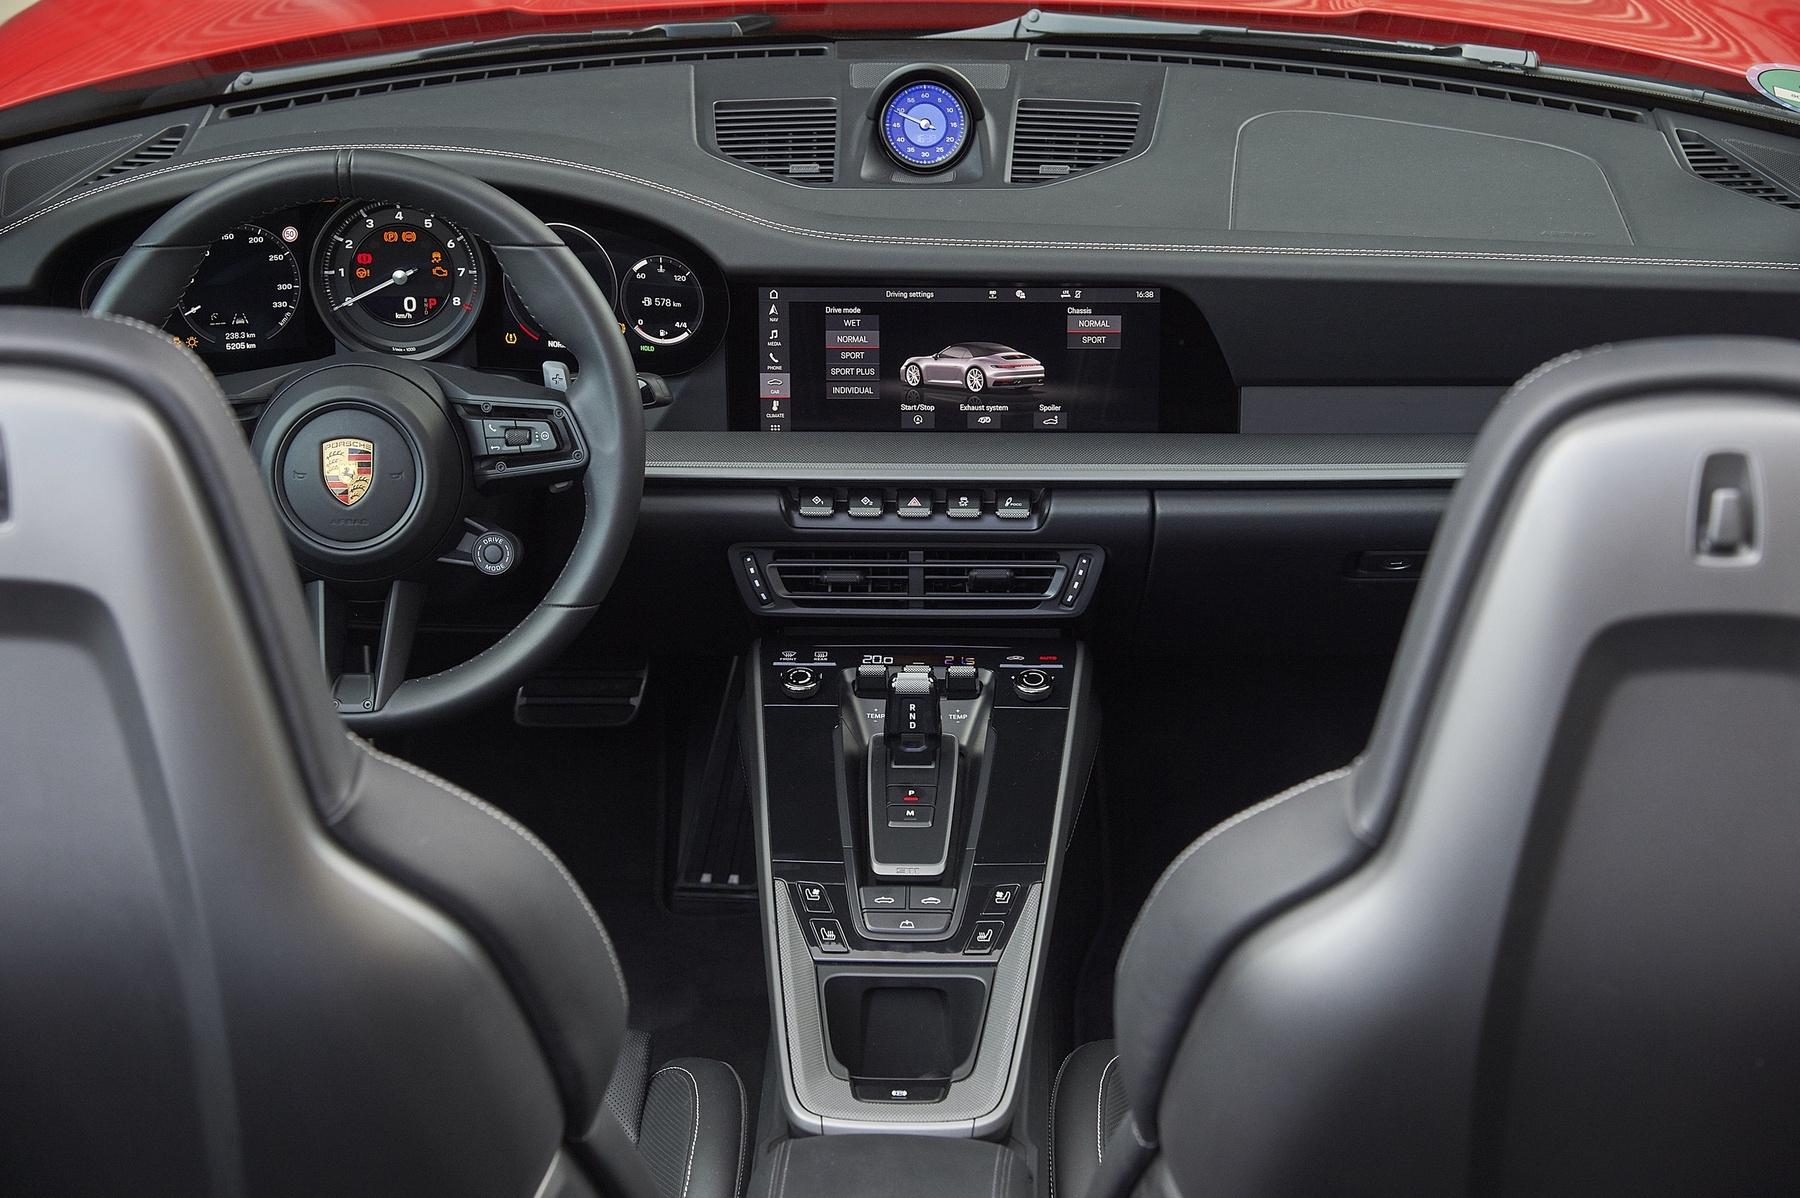 Test_Drive_Porsche_911_Athens_0145